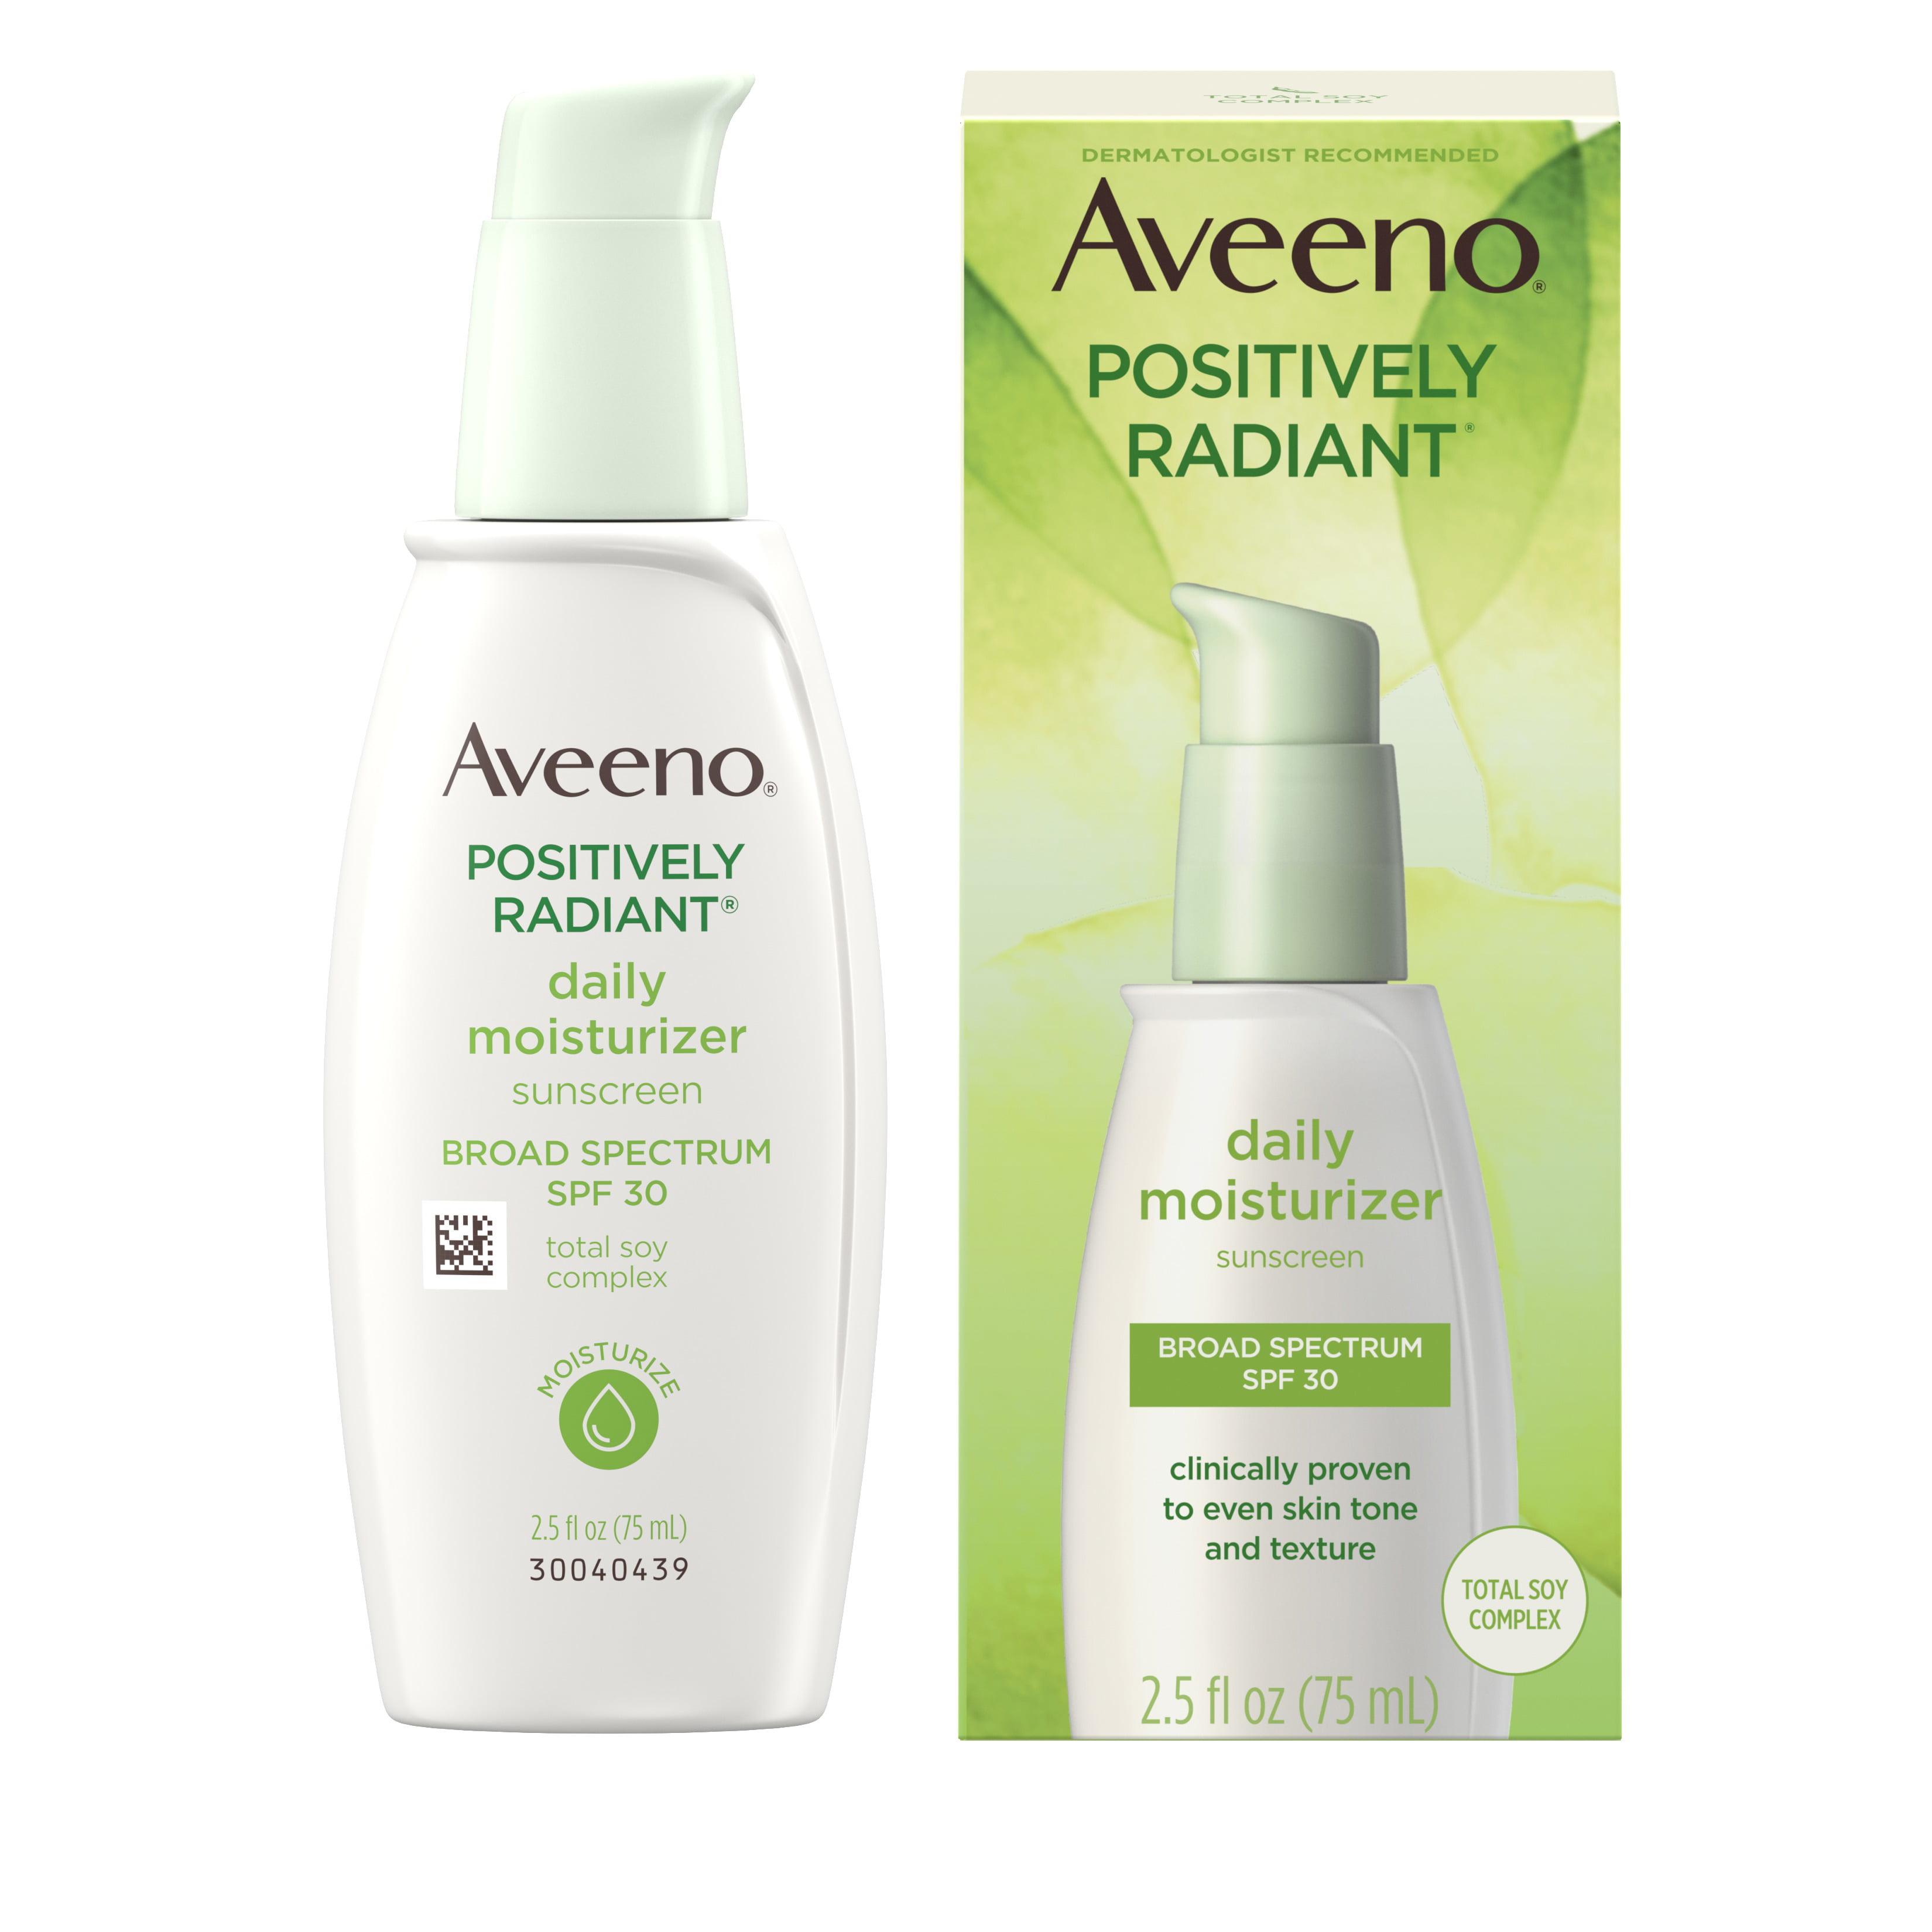 Aveeno Positively Radiant Daily Moisturizer with Soy - 2.5 fl oz - SPF 30